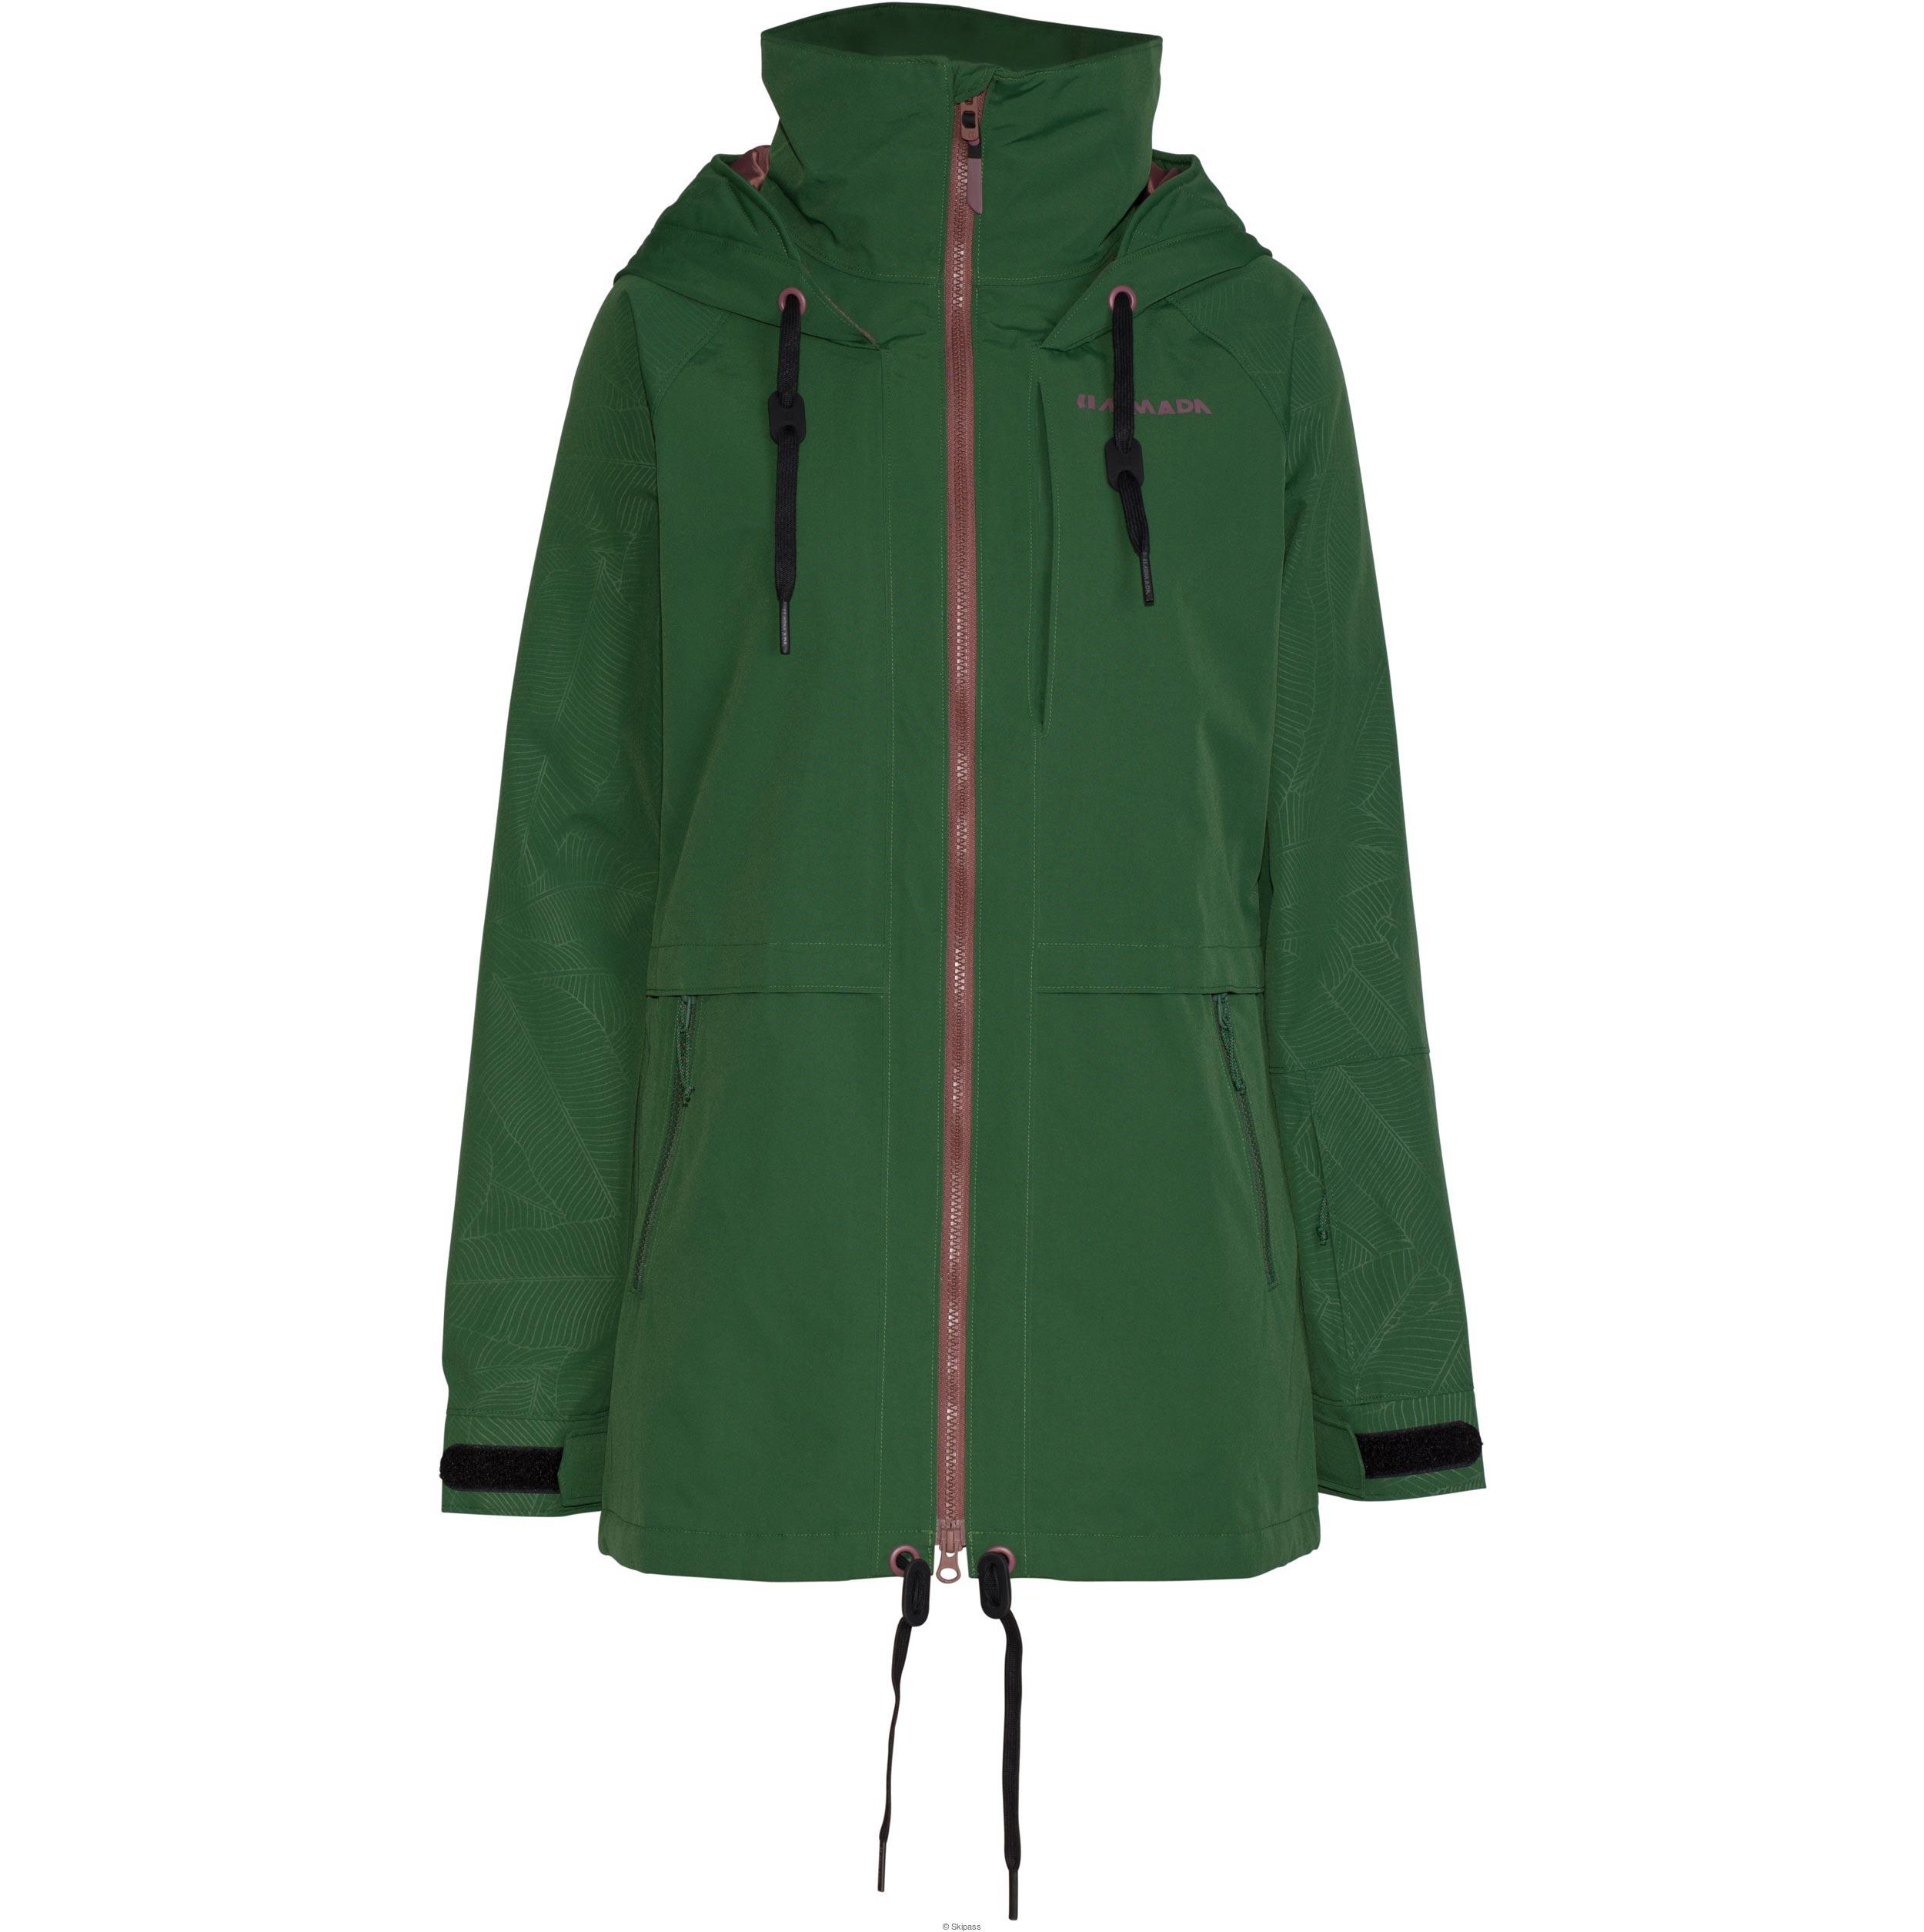 Jacket Remise Gypsum Armada forest green f6gyvbY7